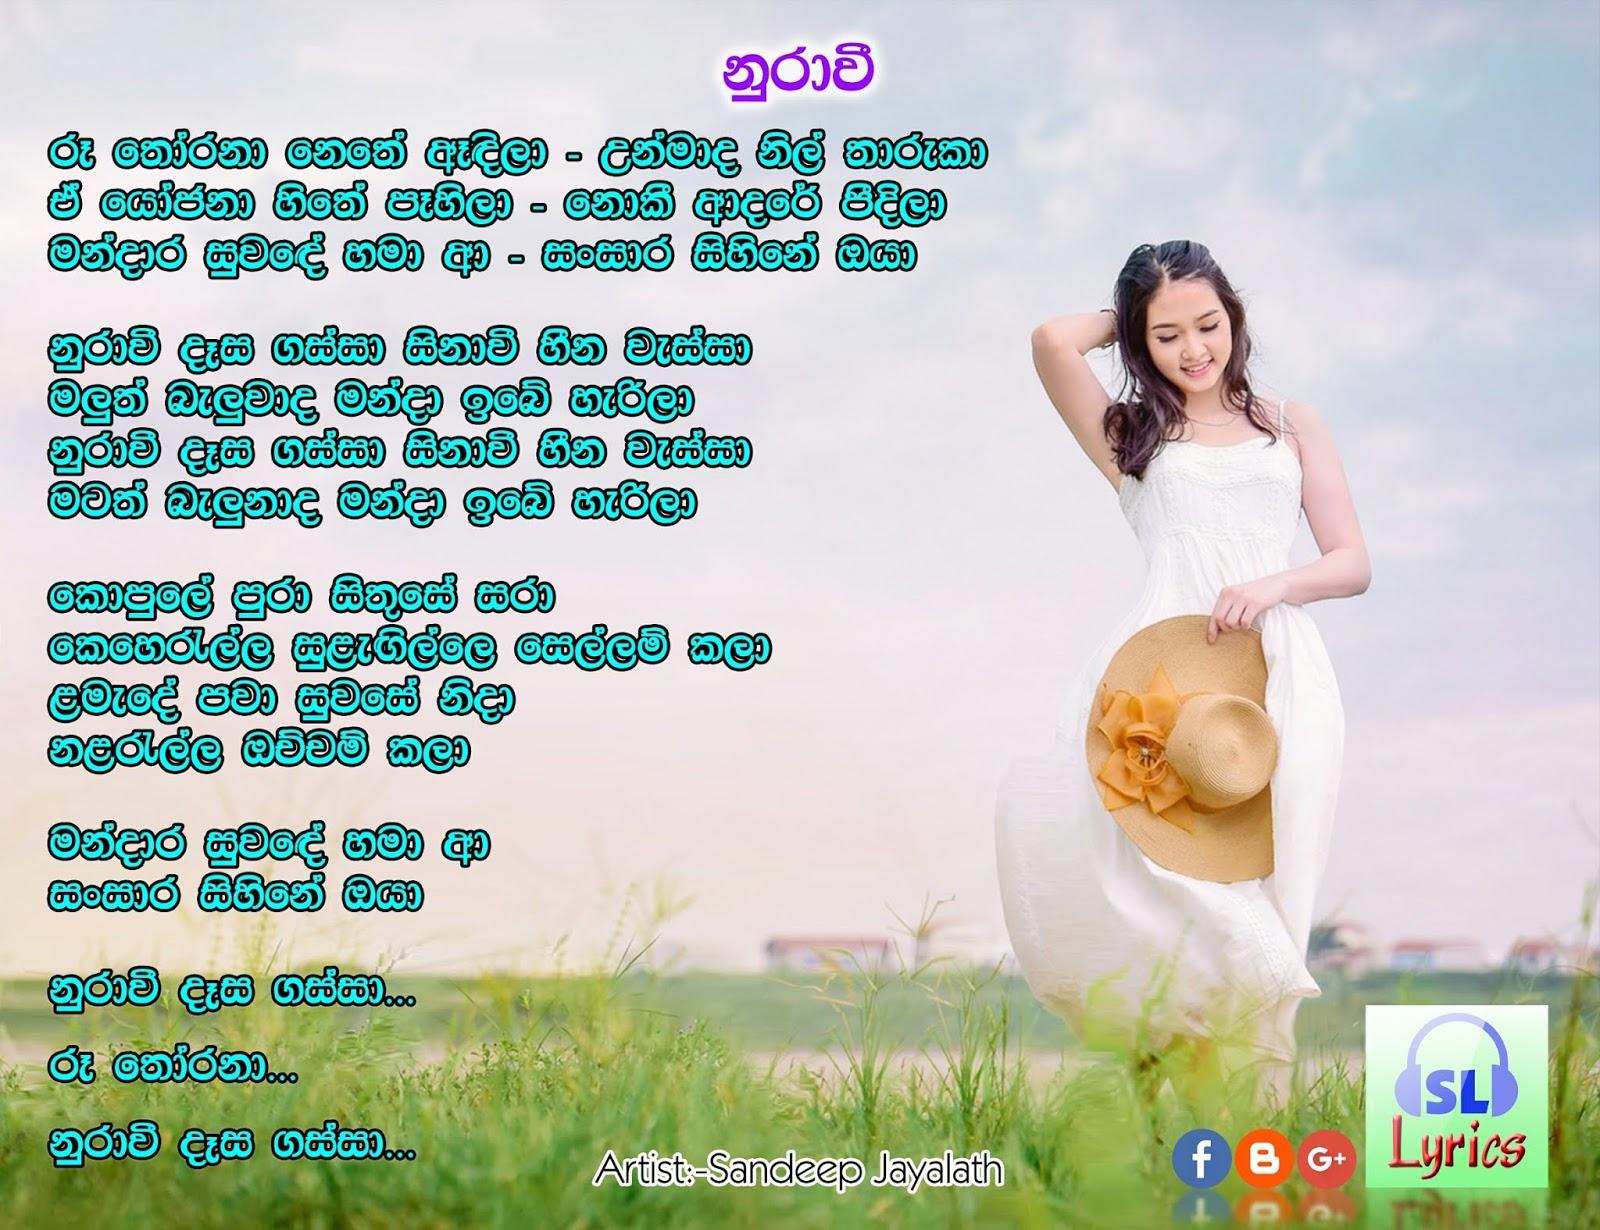 Sinhala Wedding Song